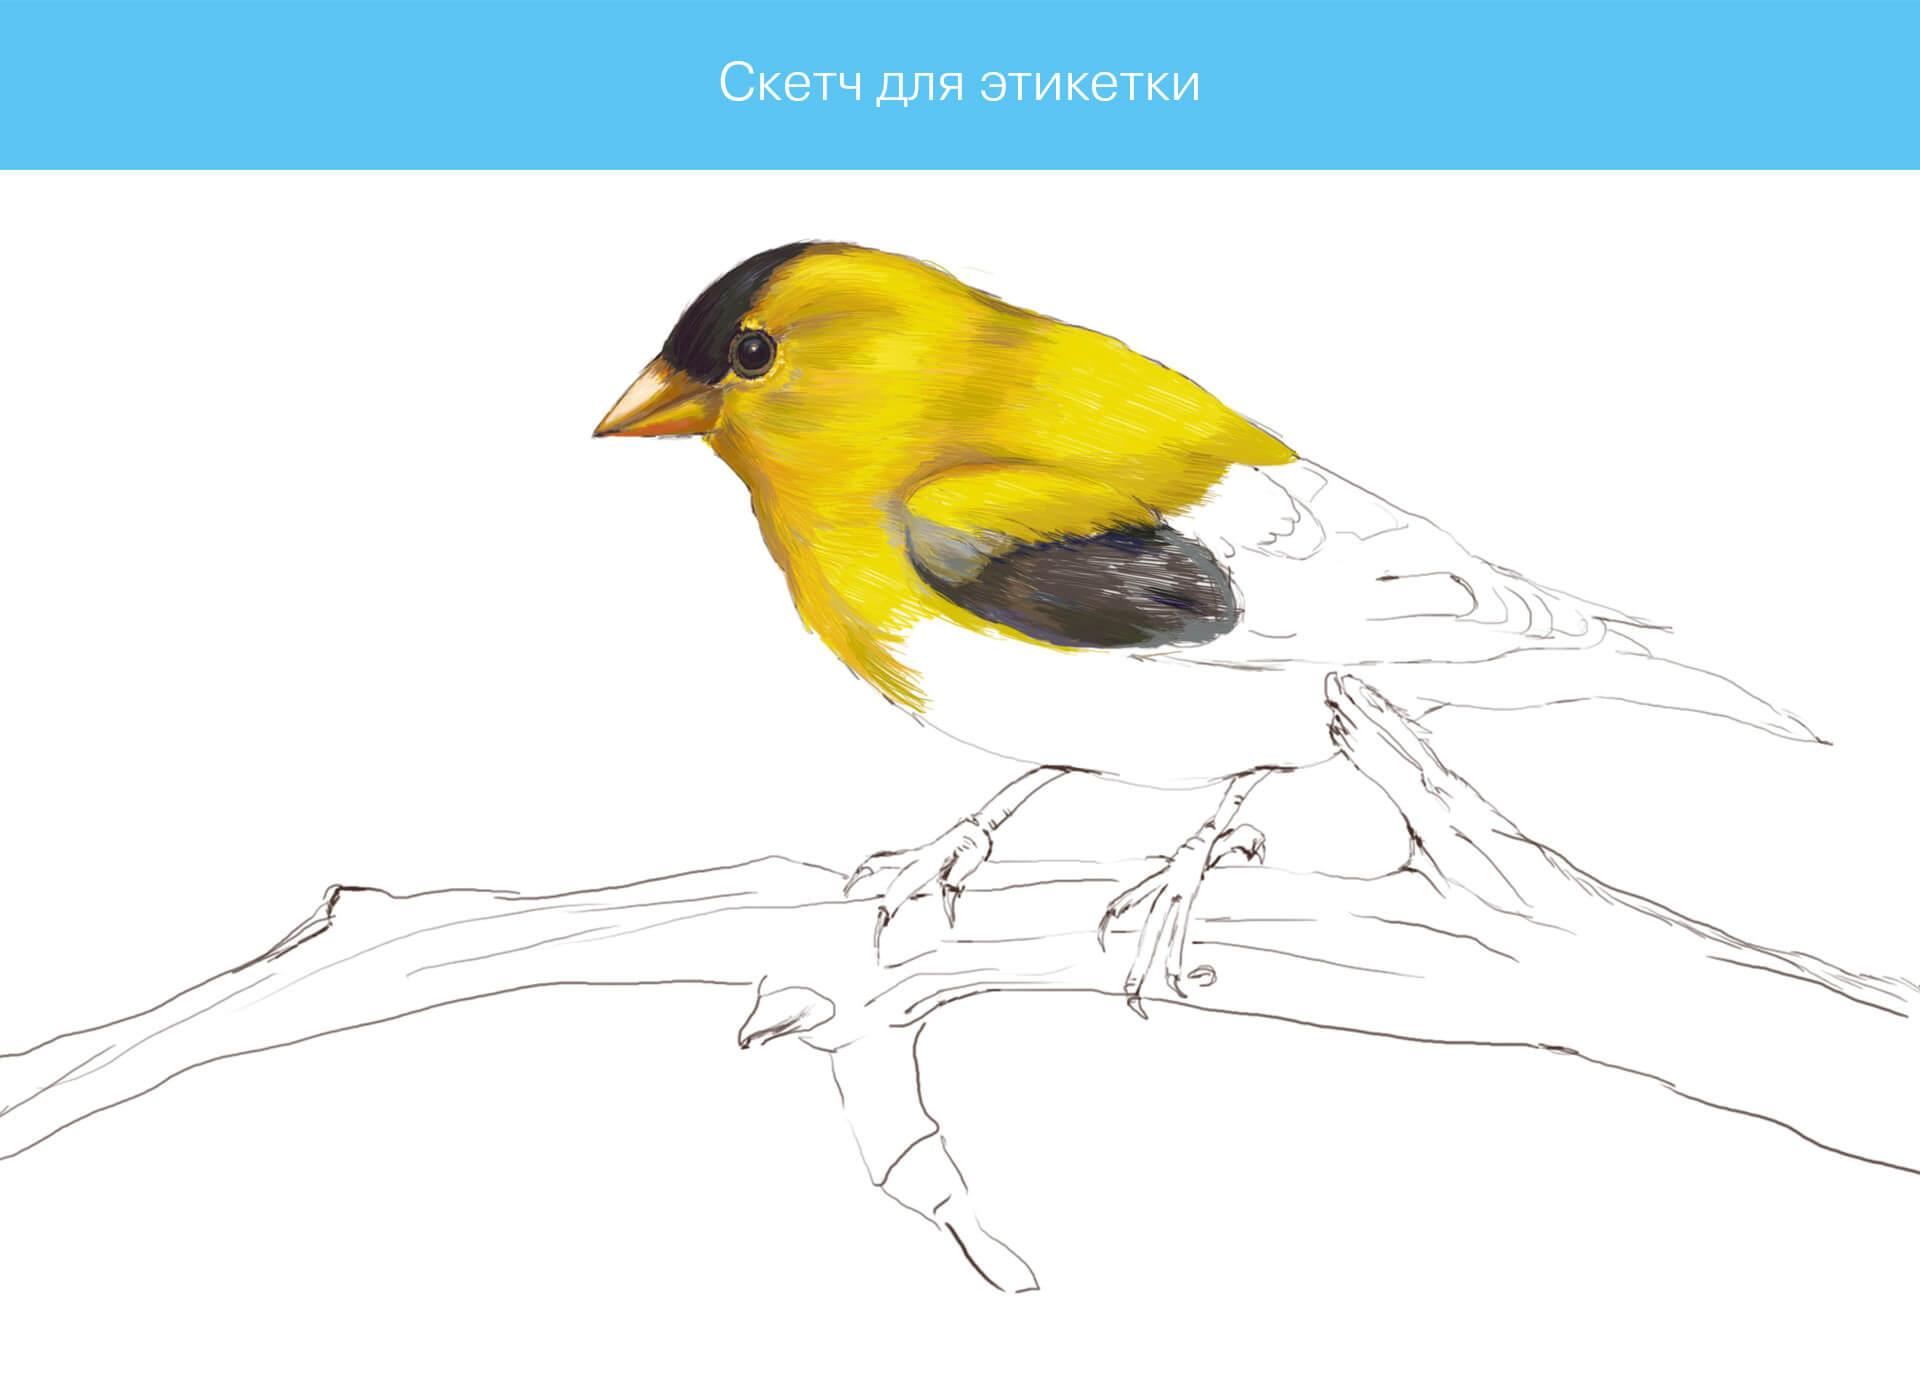 Prokochuk_Irina_Illustration_bird_1